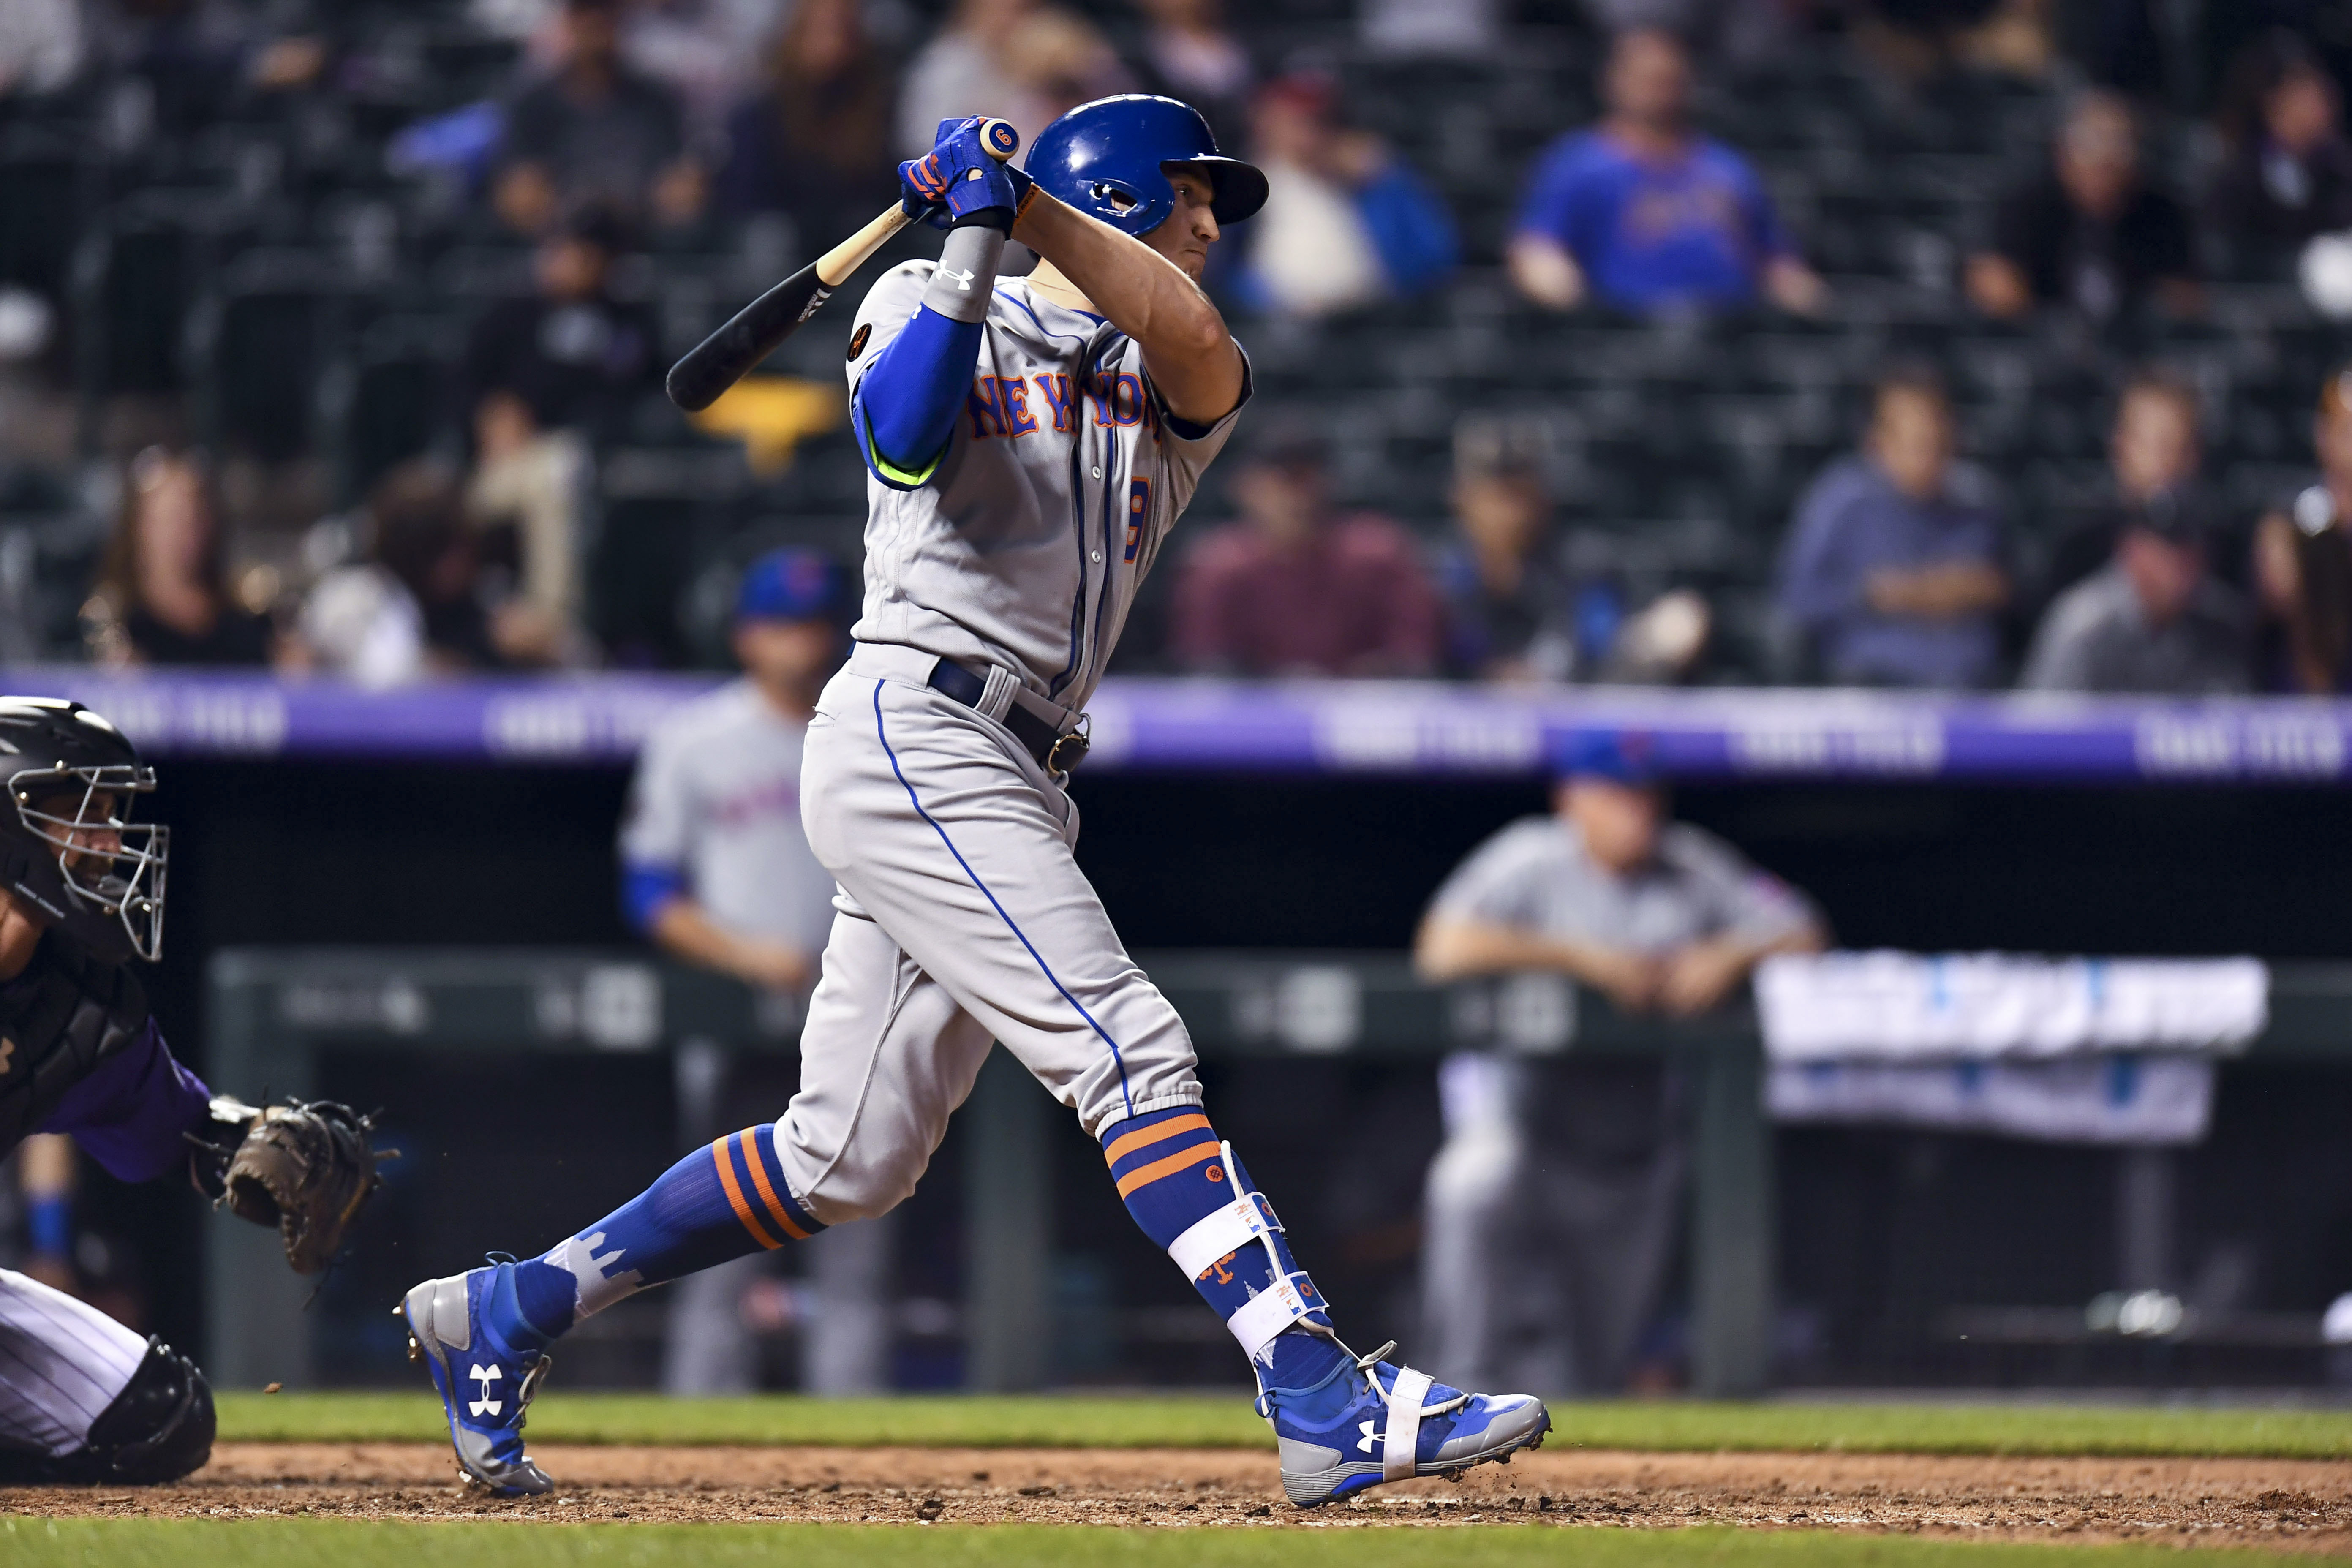 6/19/18 Game Preview: New York Mets at Colorado Rockies